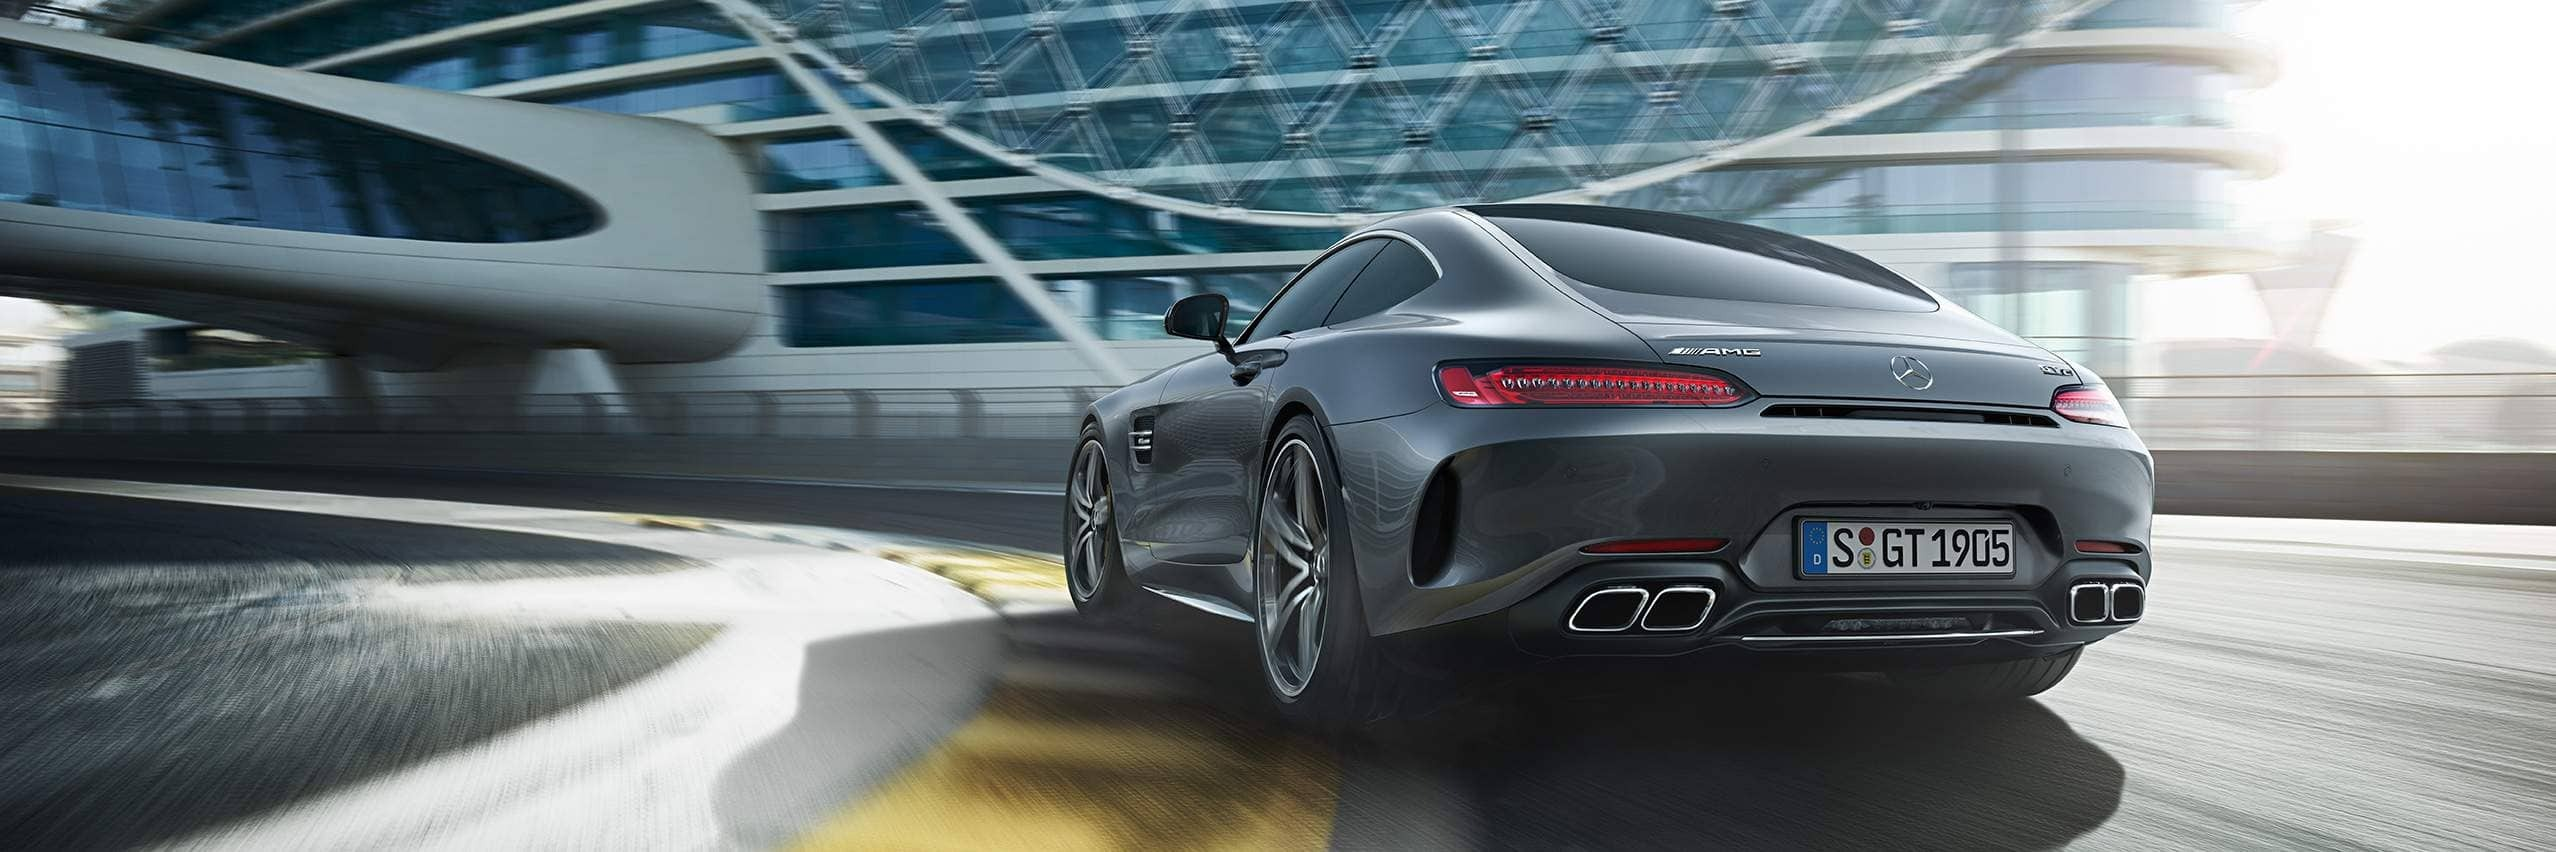 МощностьMercedes AMG GT Coupe